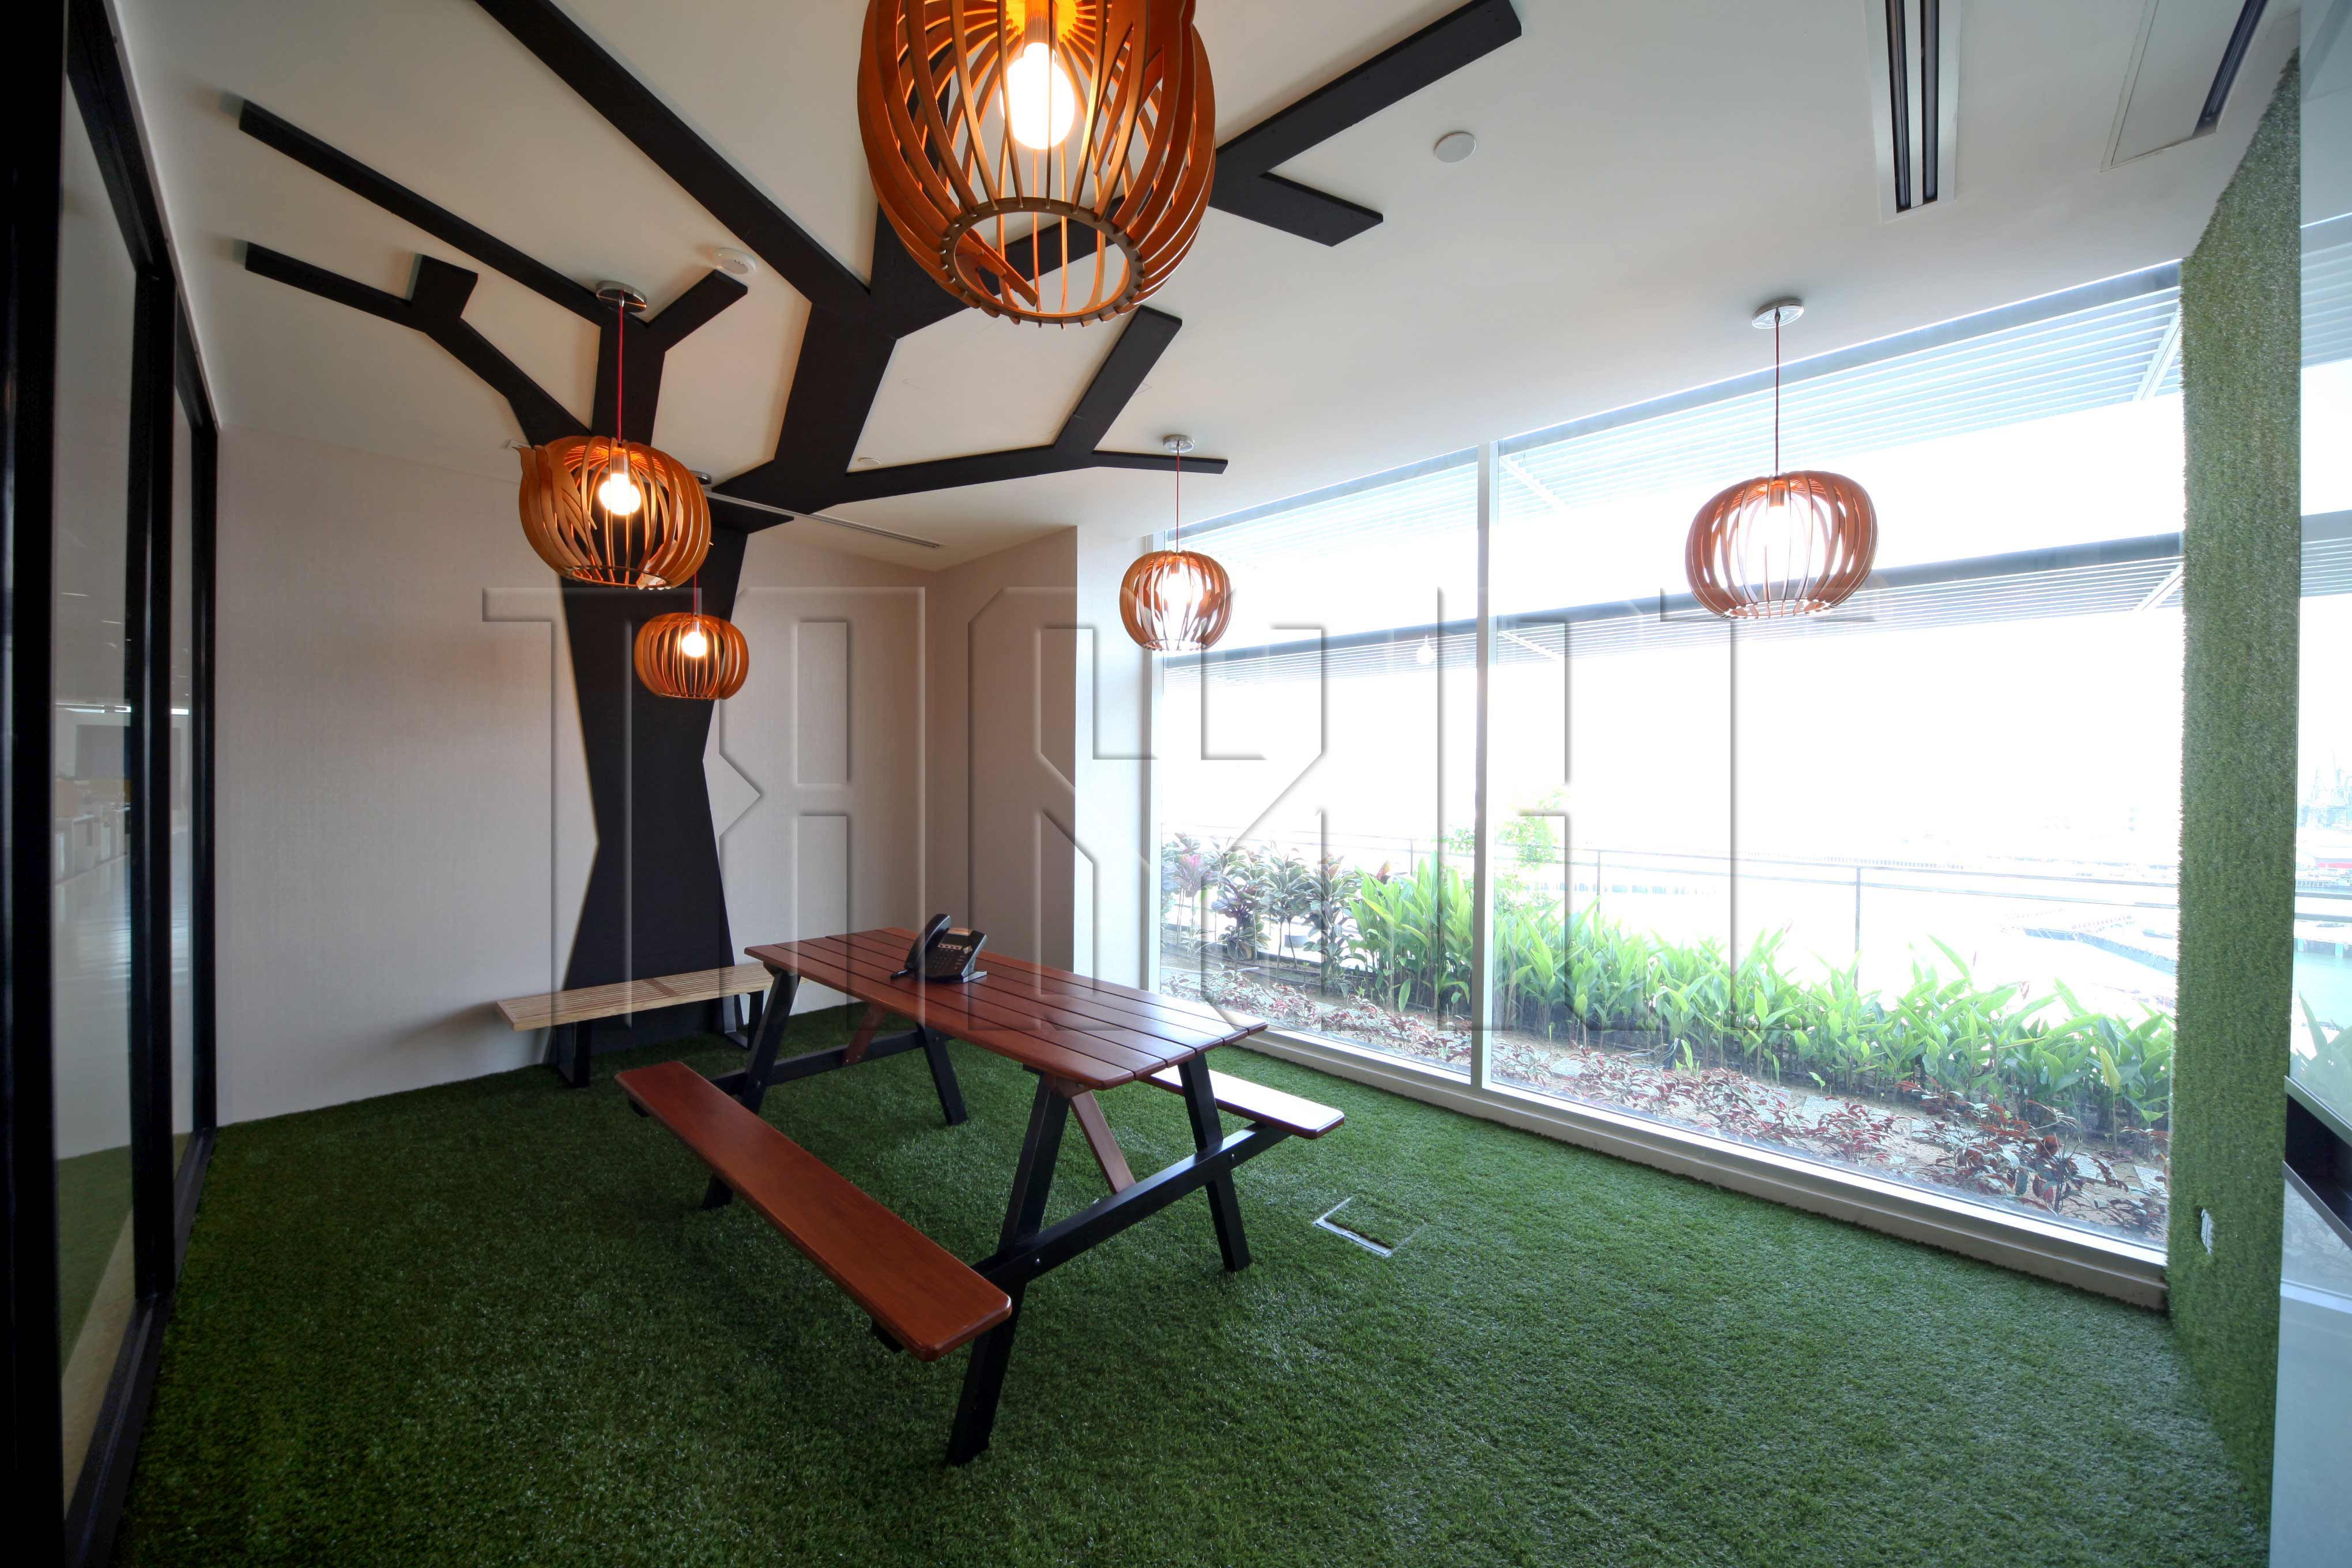 garden office interiors. gardenlike meeting room theme with bird cages pendant lights garden office interiors t